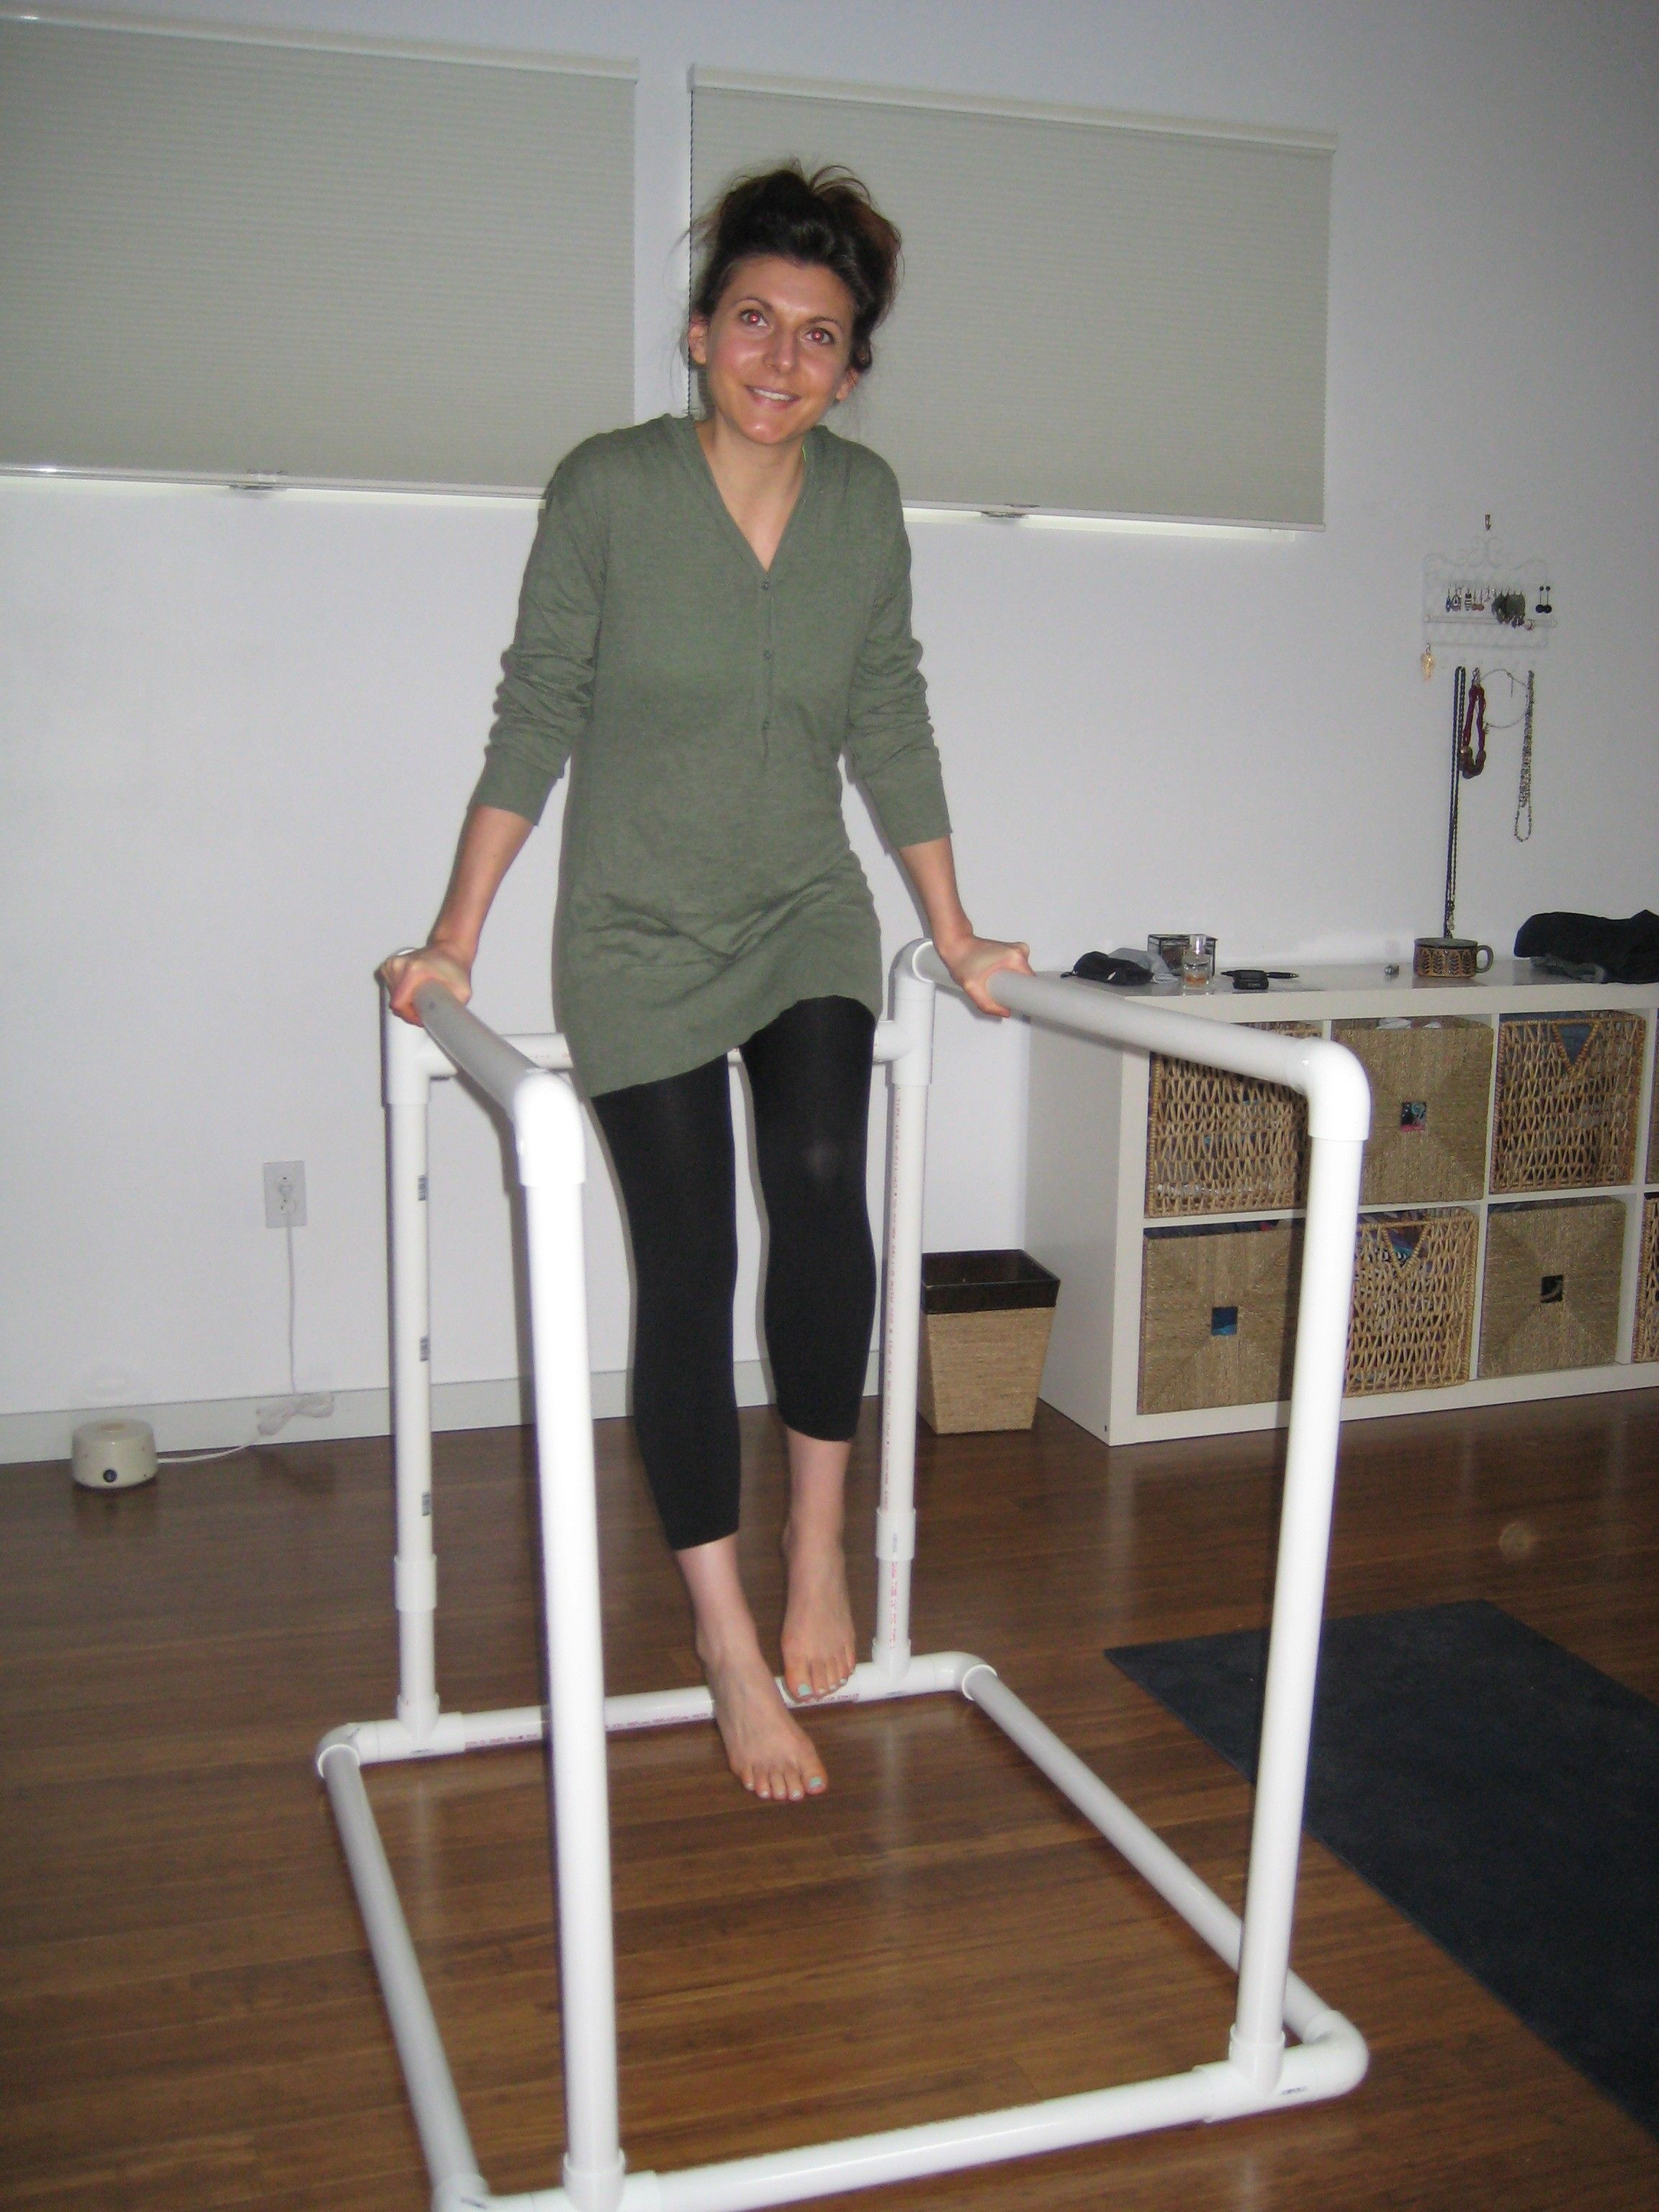 diy pvc dip / parallel bars | home gym | pinterest | gimnasio